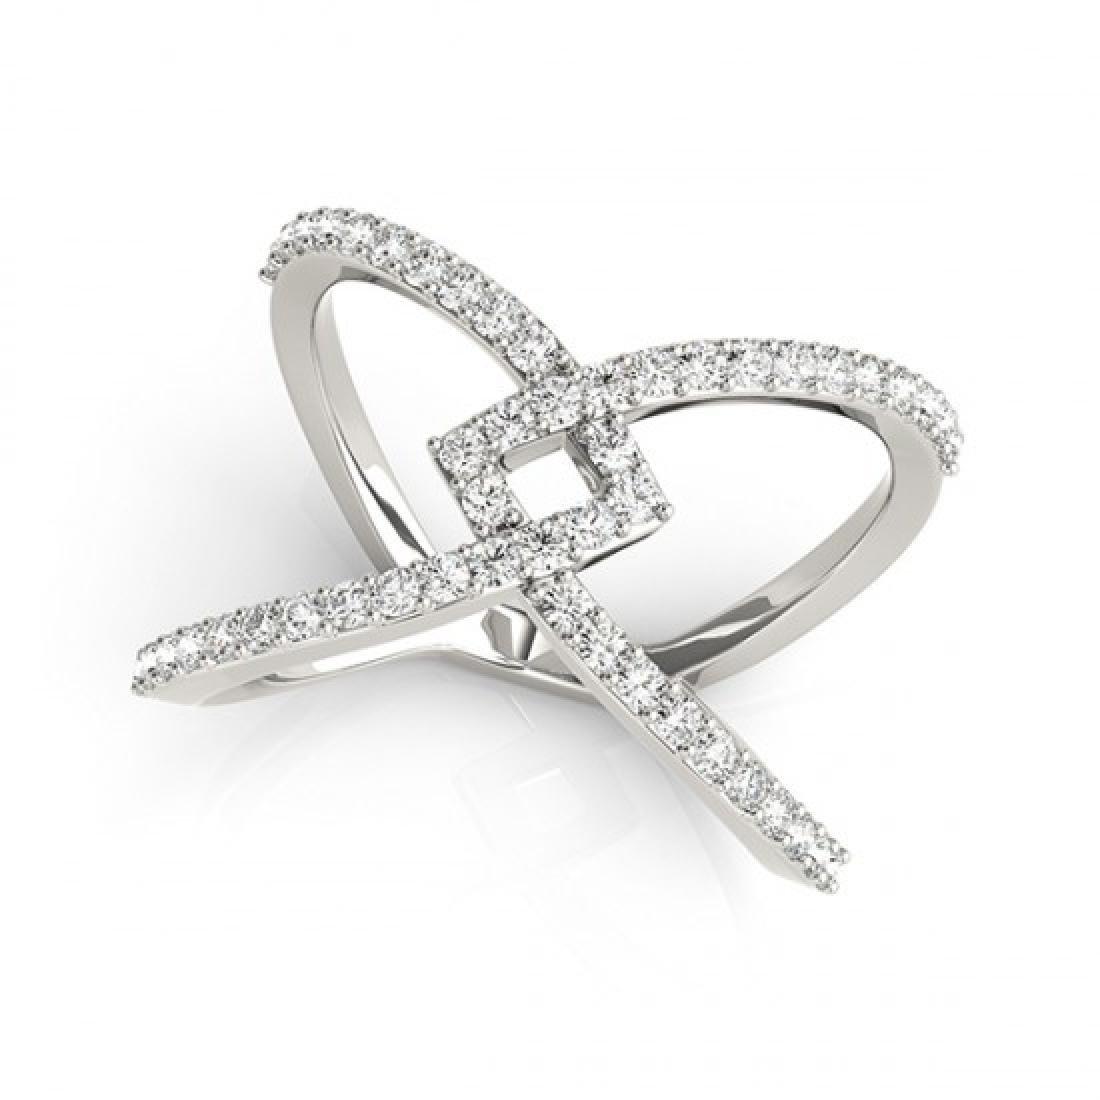 0.60 CTW Certified VS/SI Diamond Fashion Ring 14K White - 2